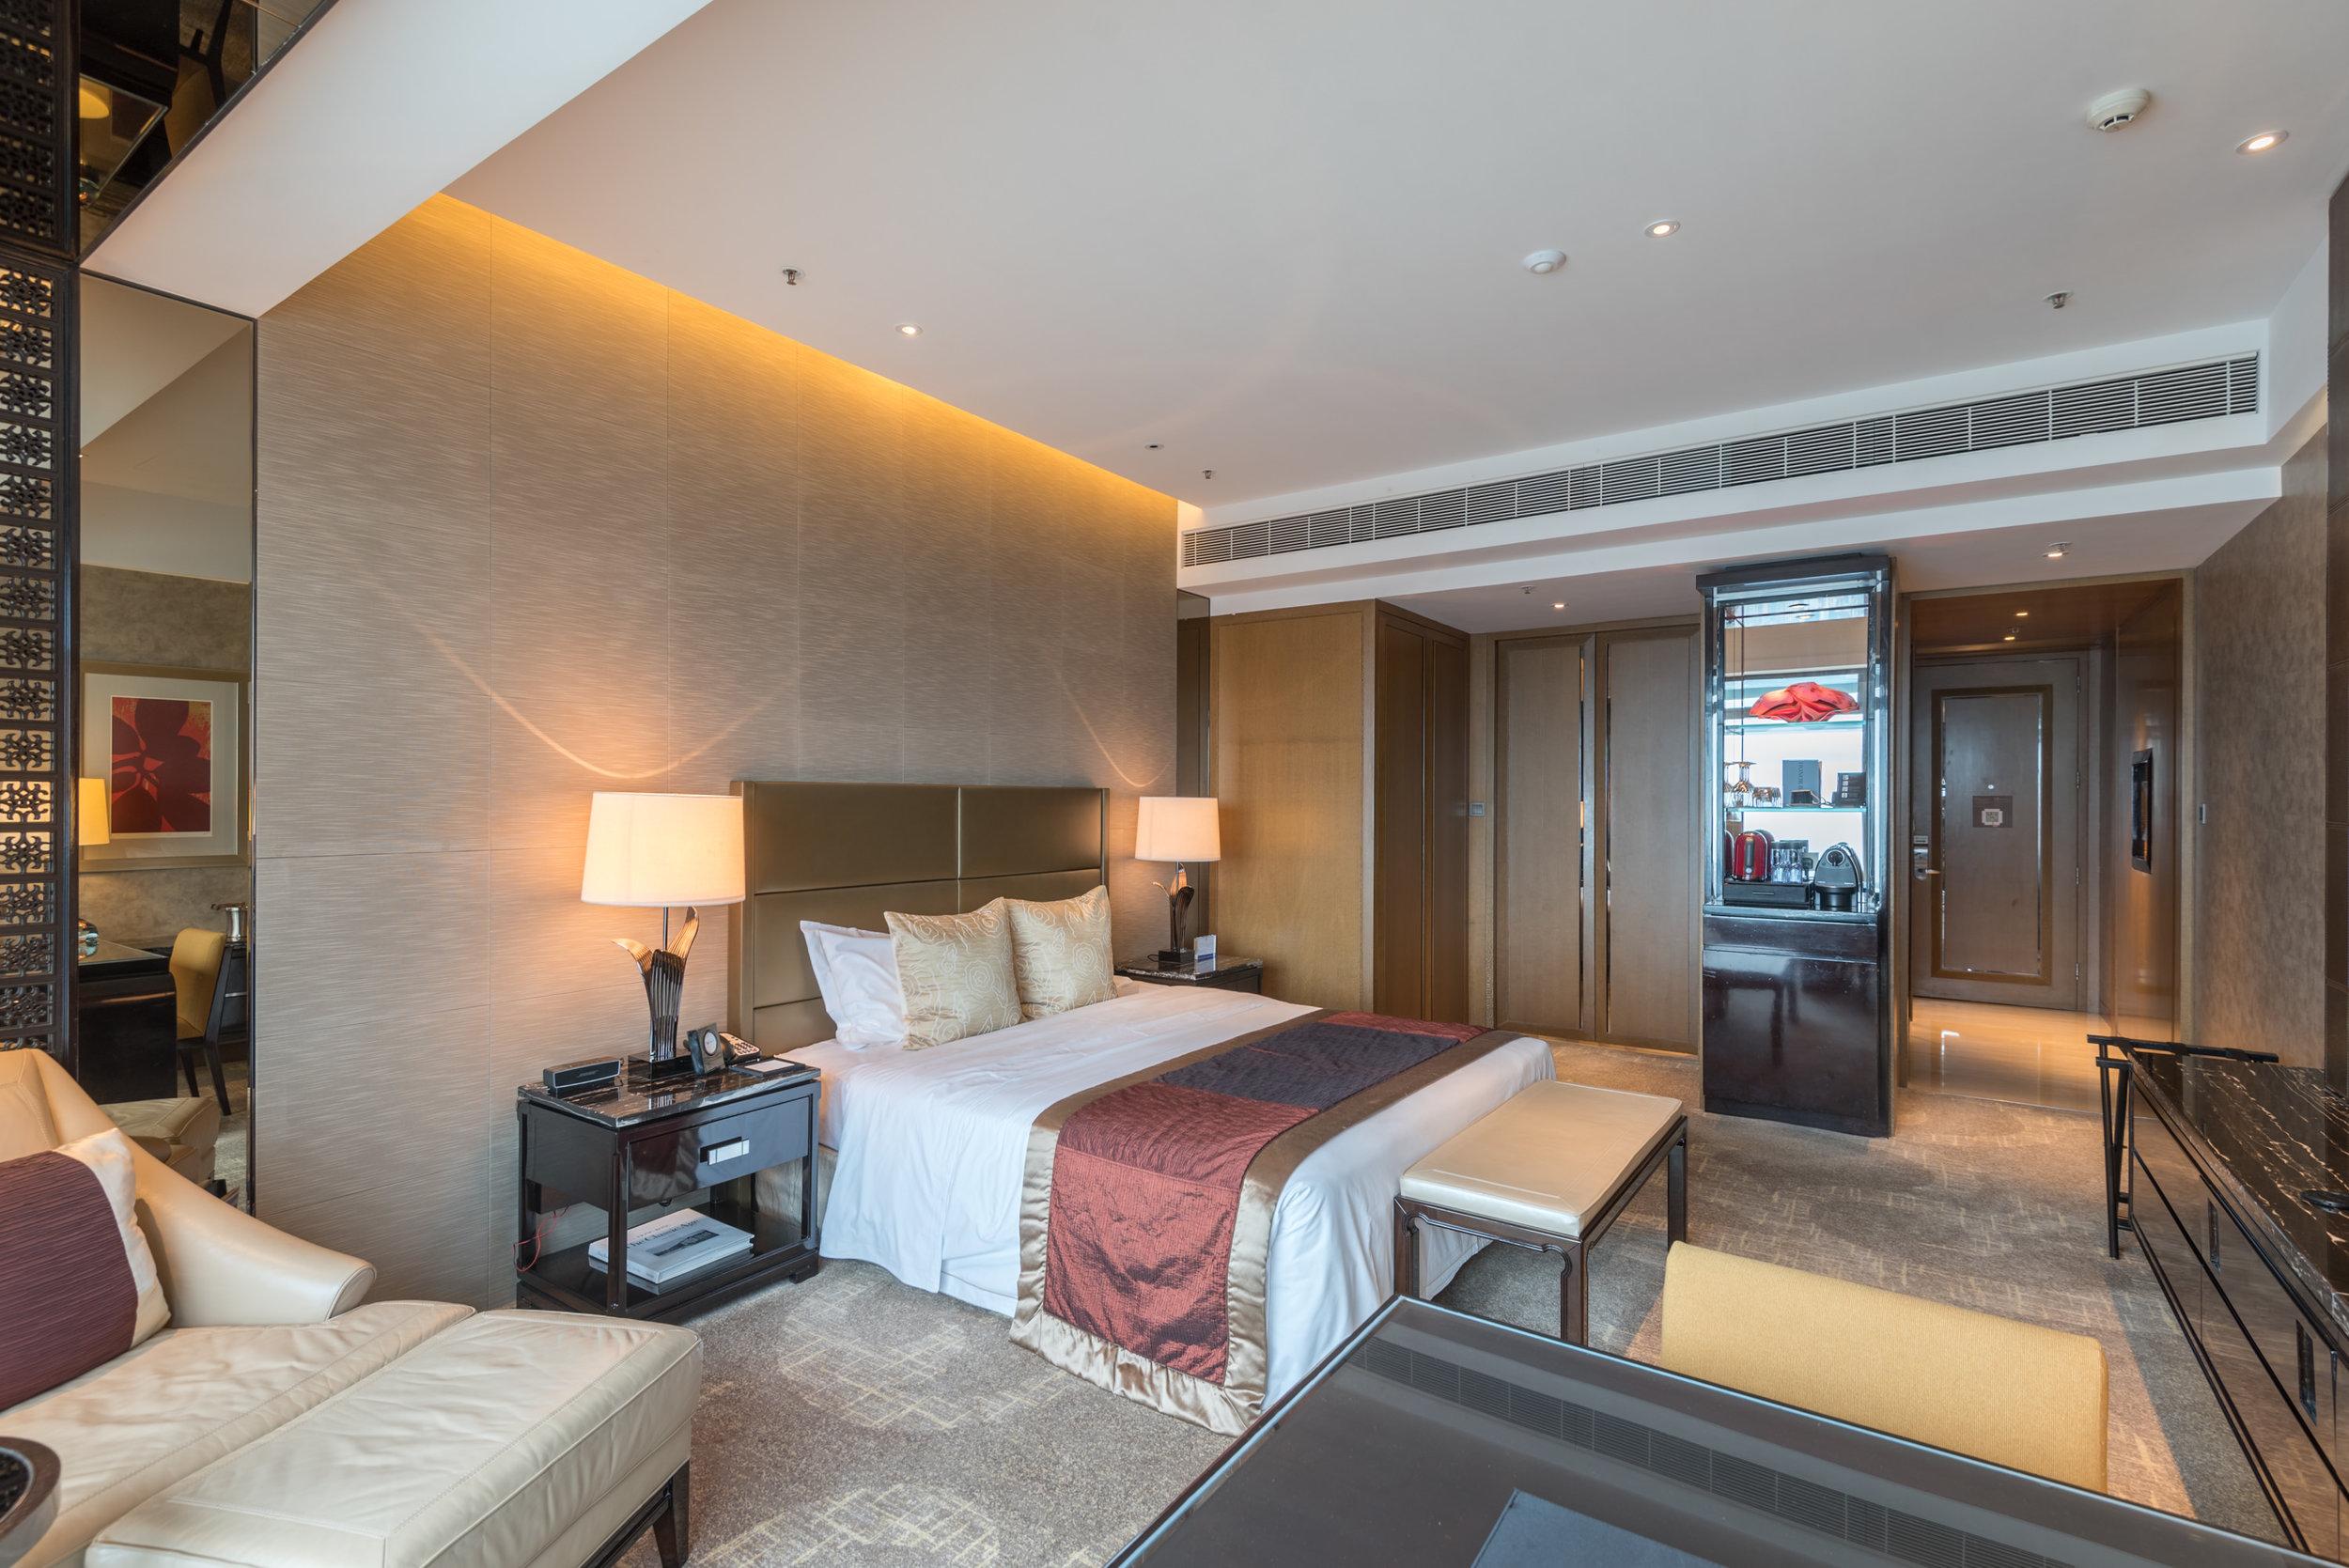 Bedroom  Club Deluxe Victoria Harbour Room - The Ritz-Carlton, Hong Kong